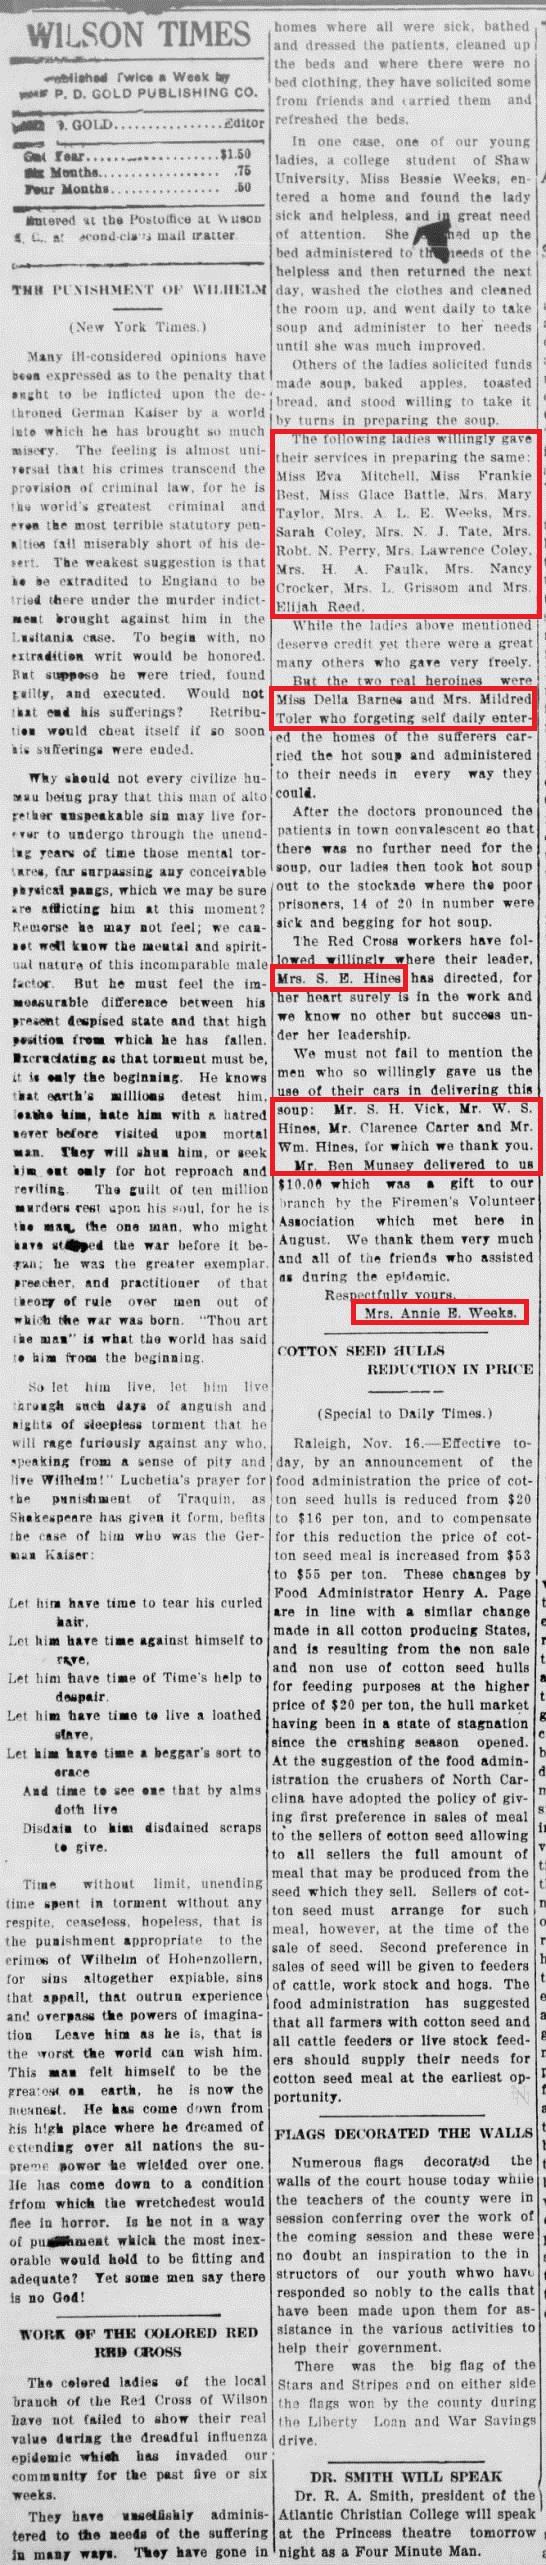 wdt-11-19-1918